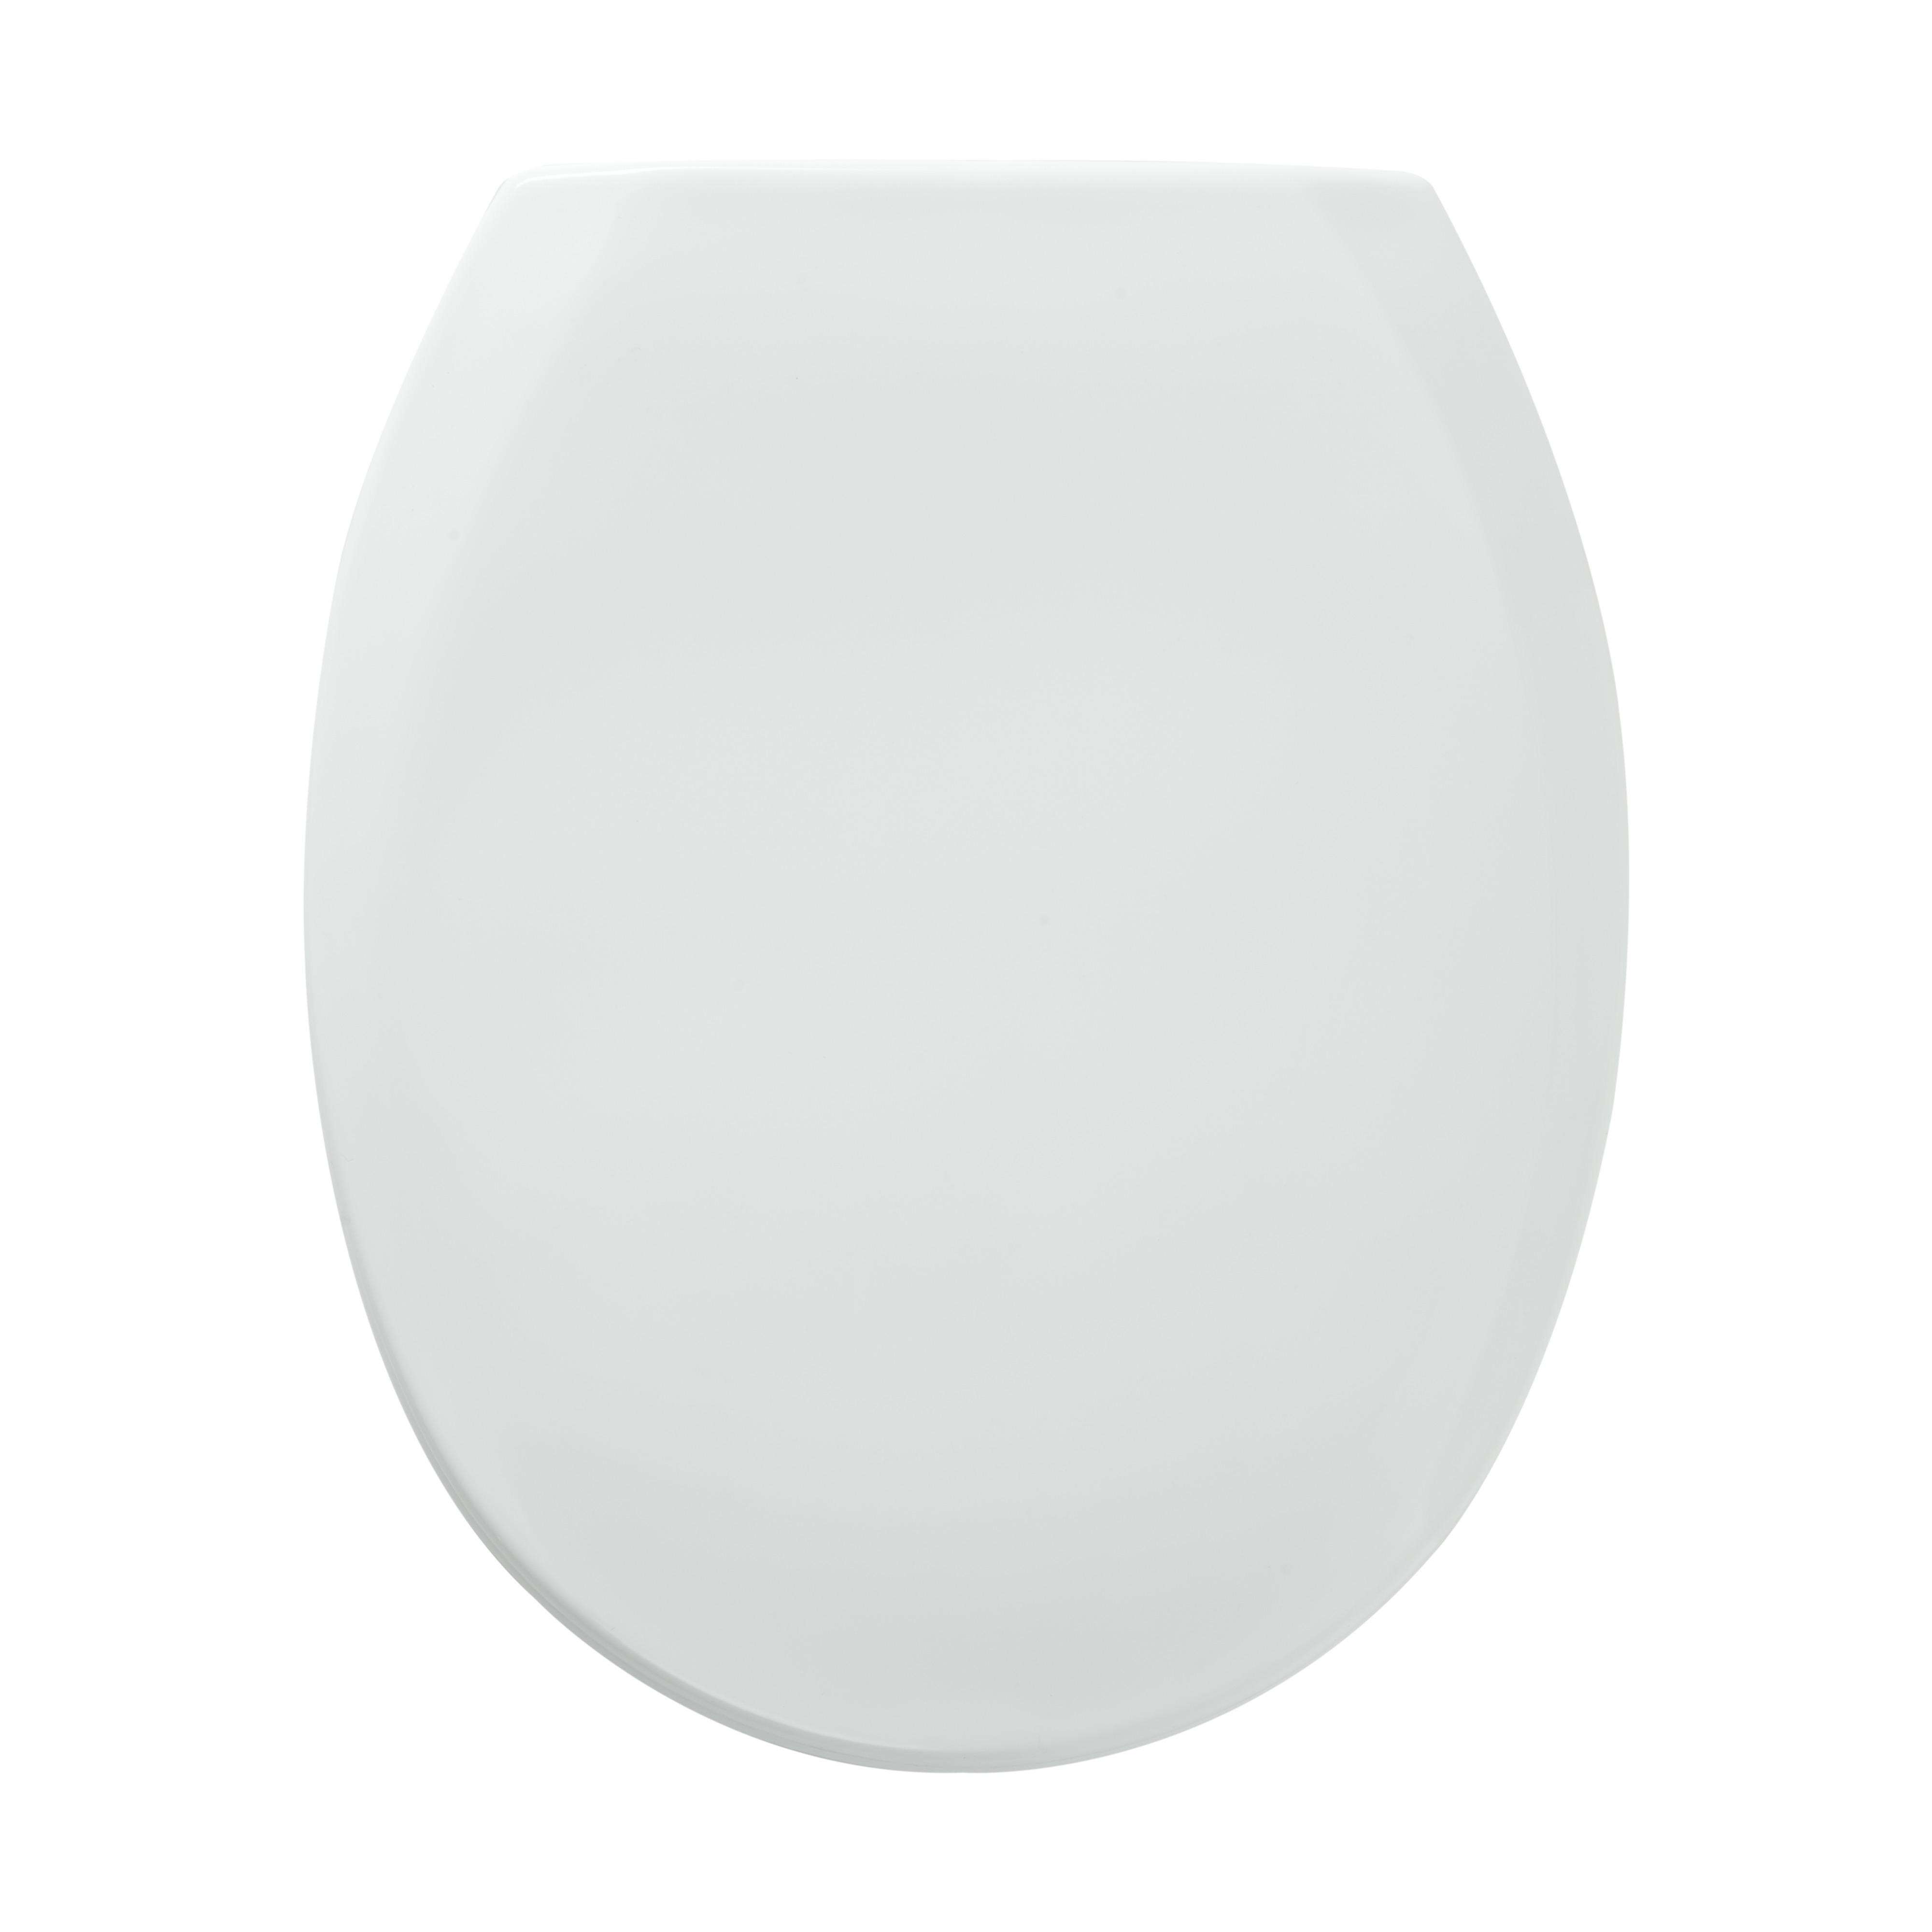 Tiger milan toiletzitting thermoplast